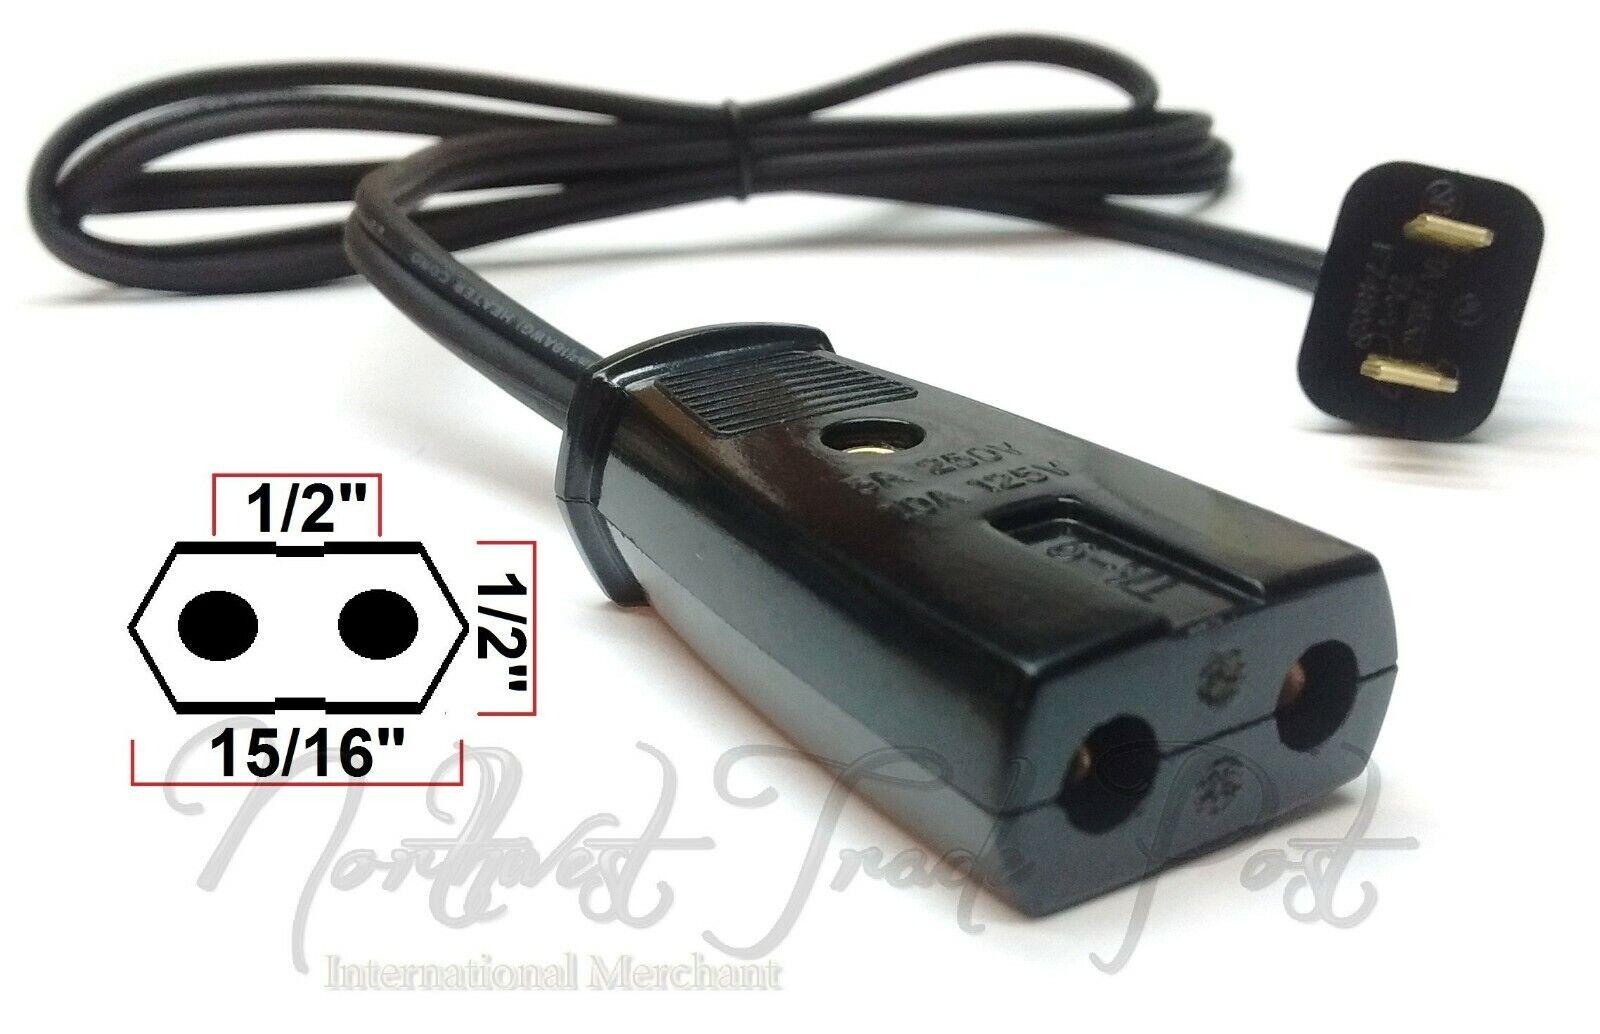 Power Cord for Presto Fry Daddy Deep Fryer Model 01 FDF1 0542003 0542004 0542006